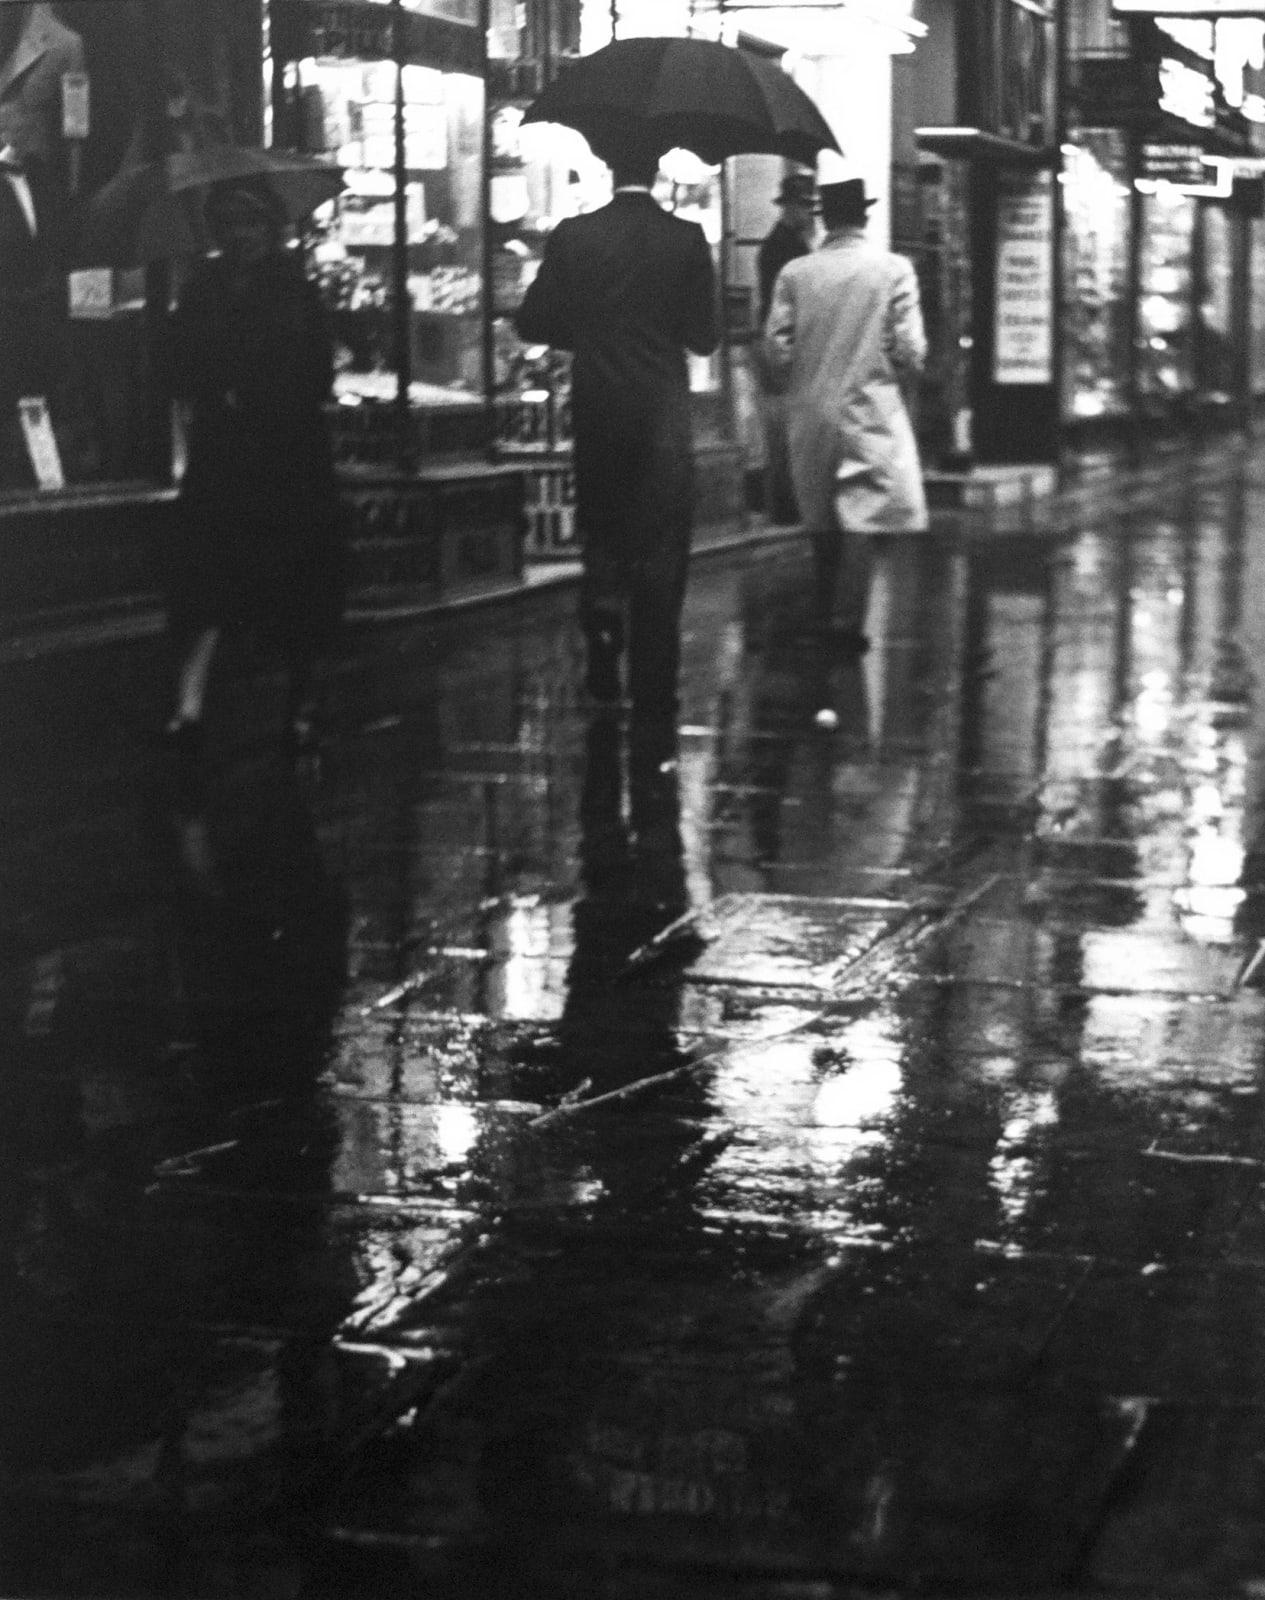 Charing Cross Road (walking in the rain), 1937